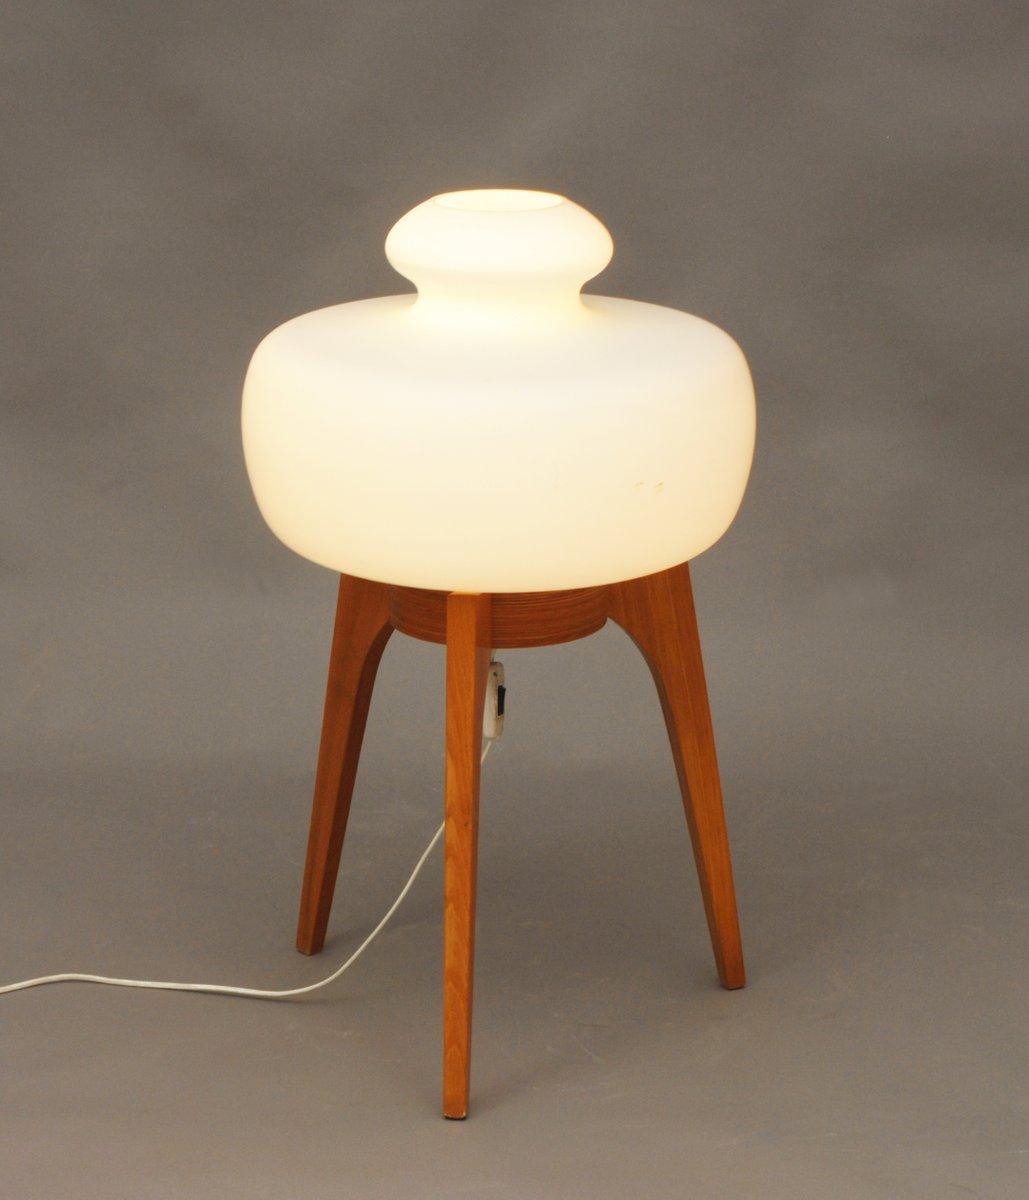 Tschechische Lampe von Krásná Jizba, 1960er